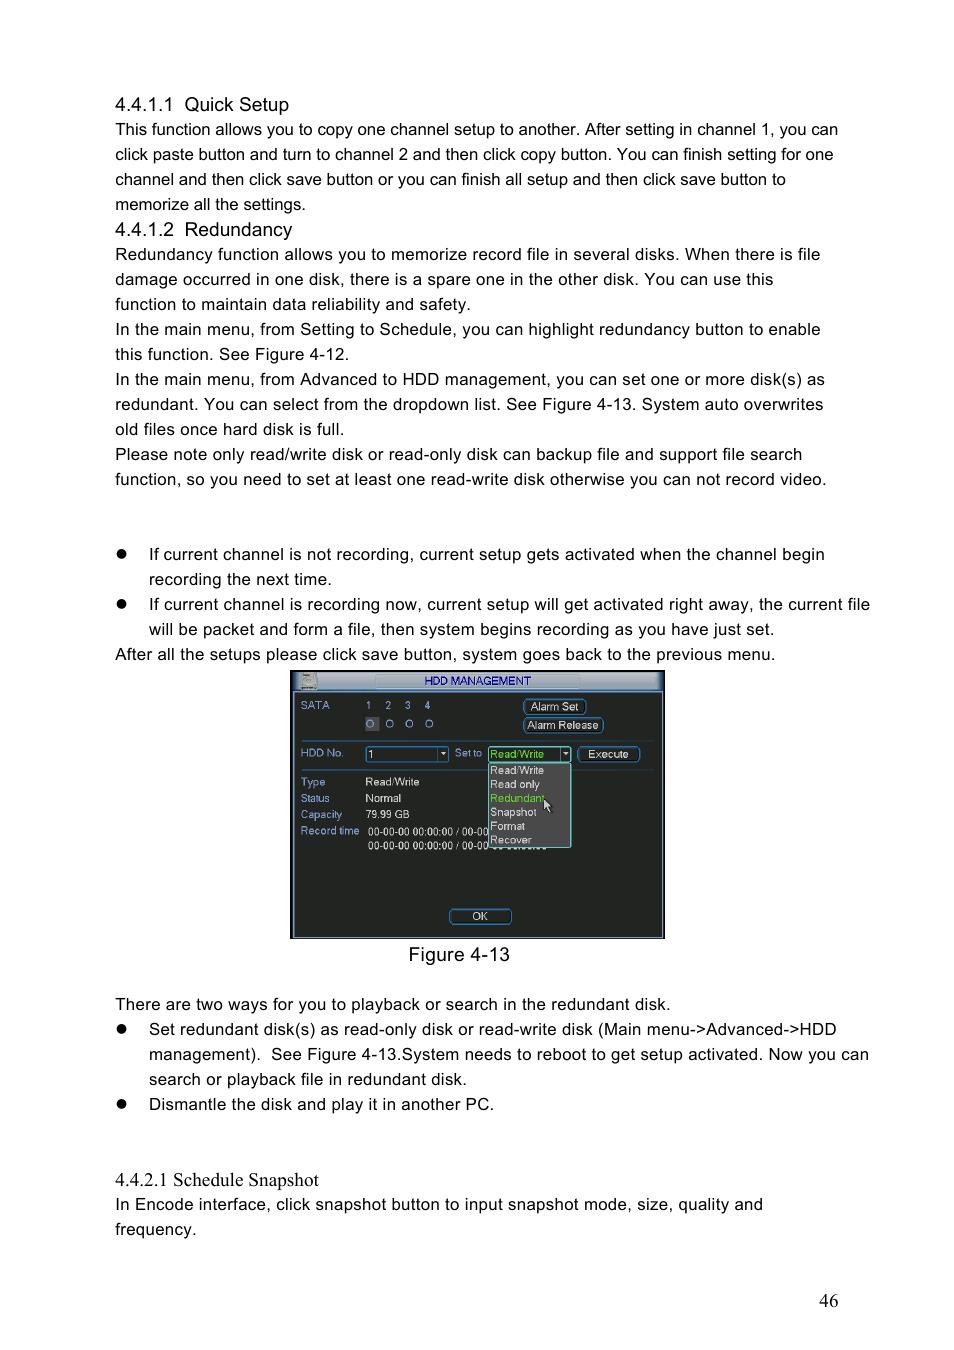 1 quick setup, 2 redundancy, 2 snapshot | Dahua Technology HE-T User